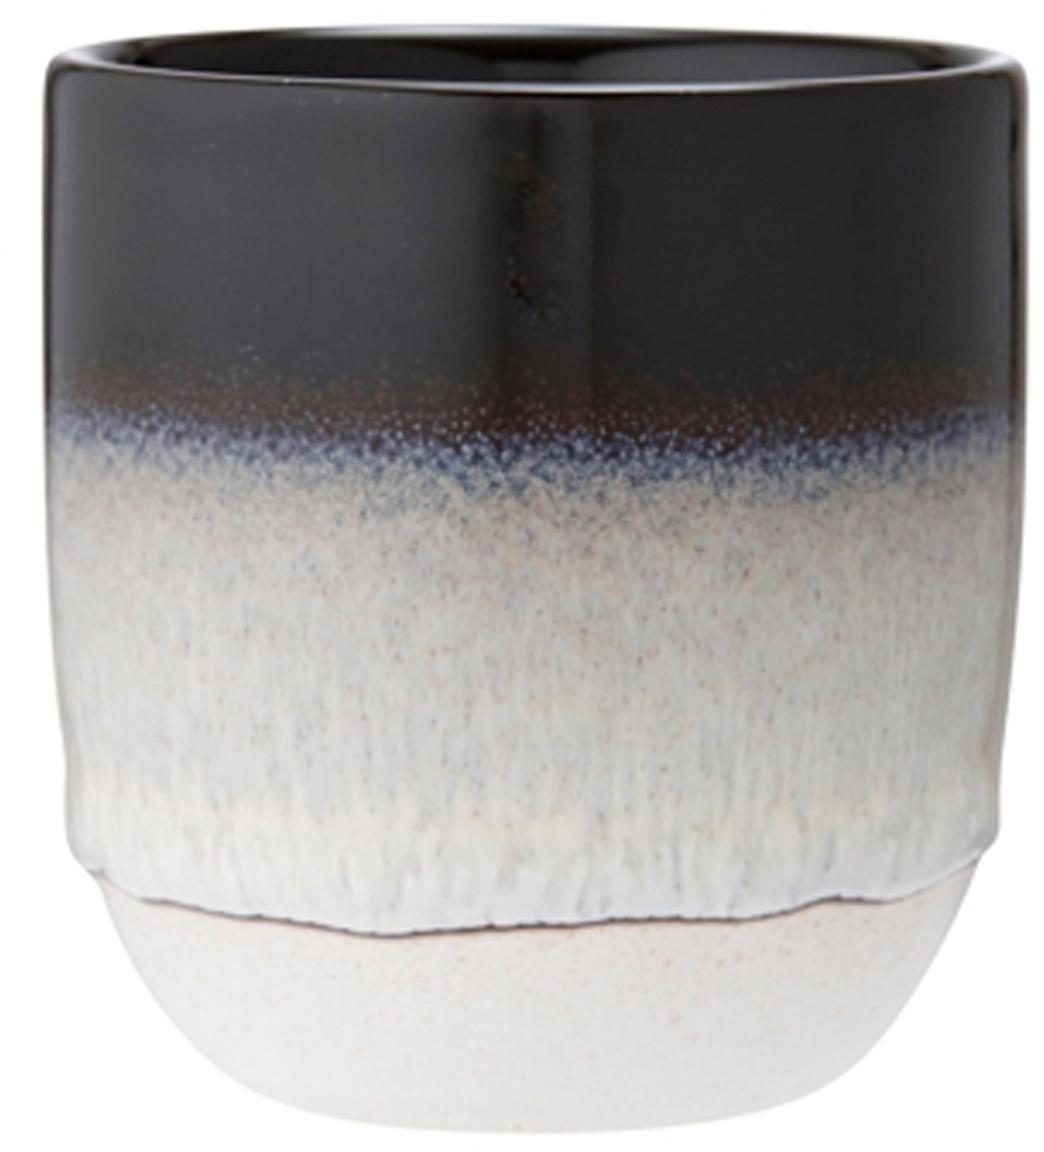 Tazza senza manico Café, 4 pz., Ceramica, Nero, Ø 8 x Alt. 9 cm